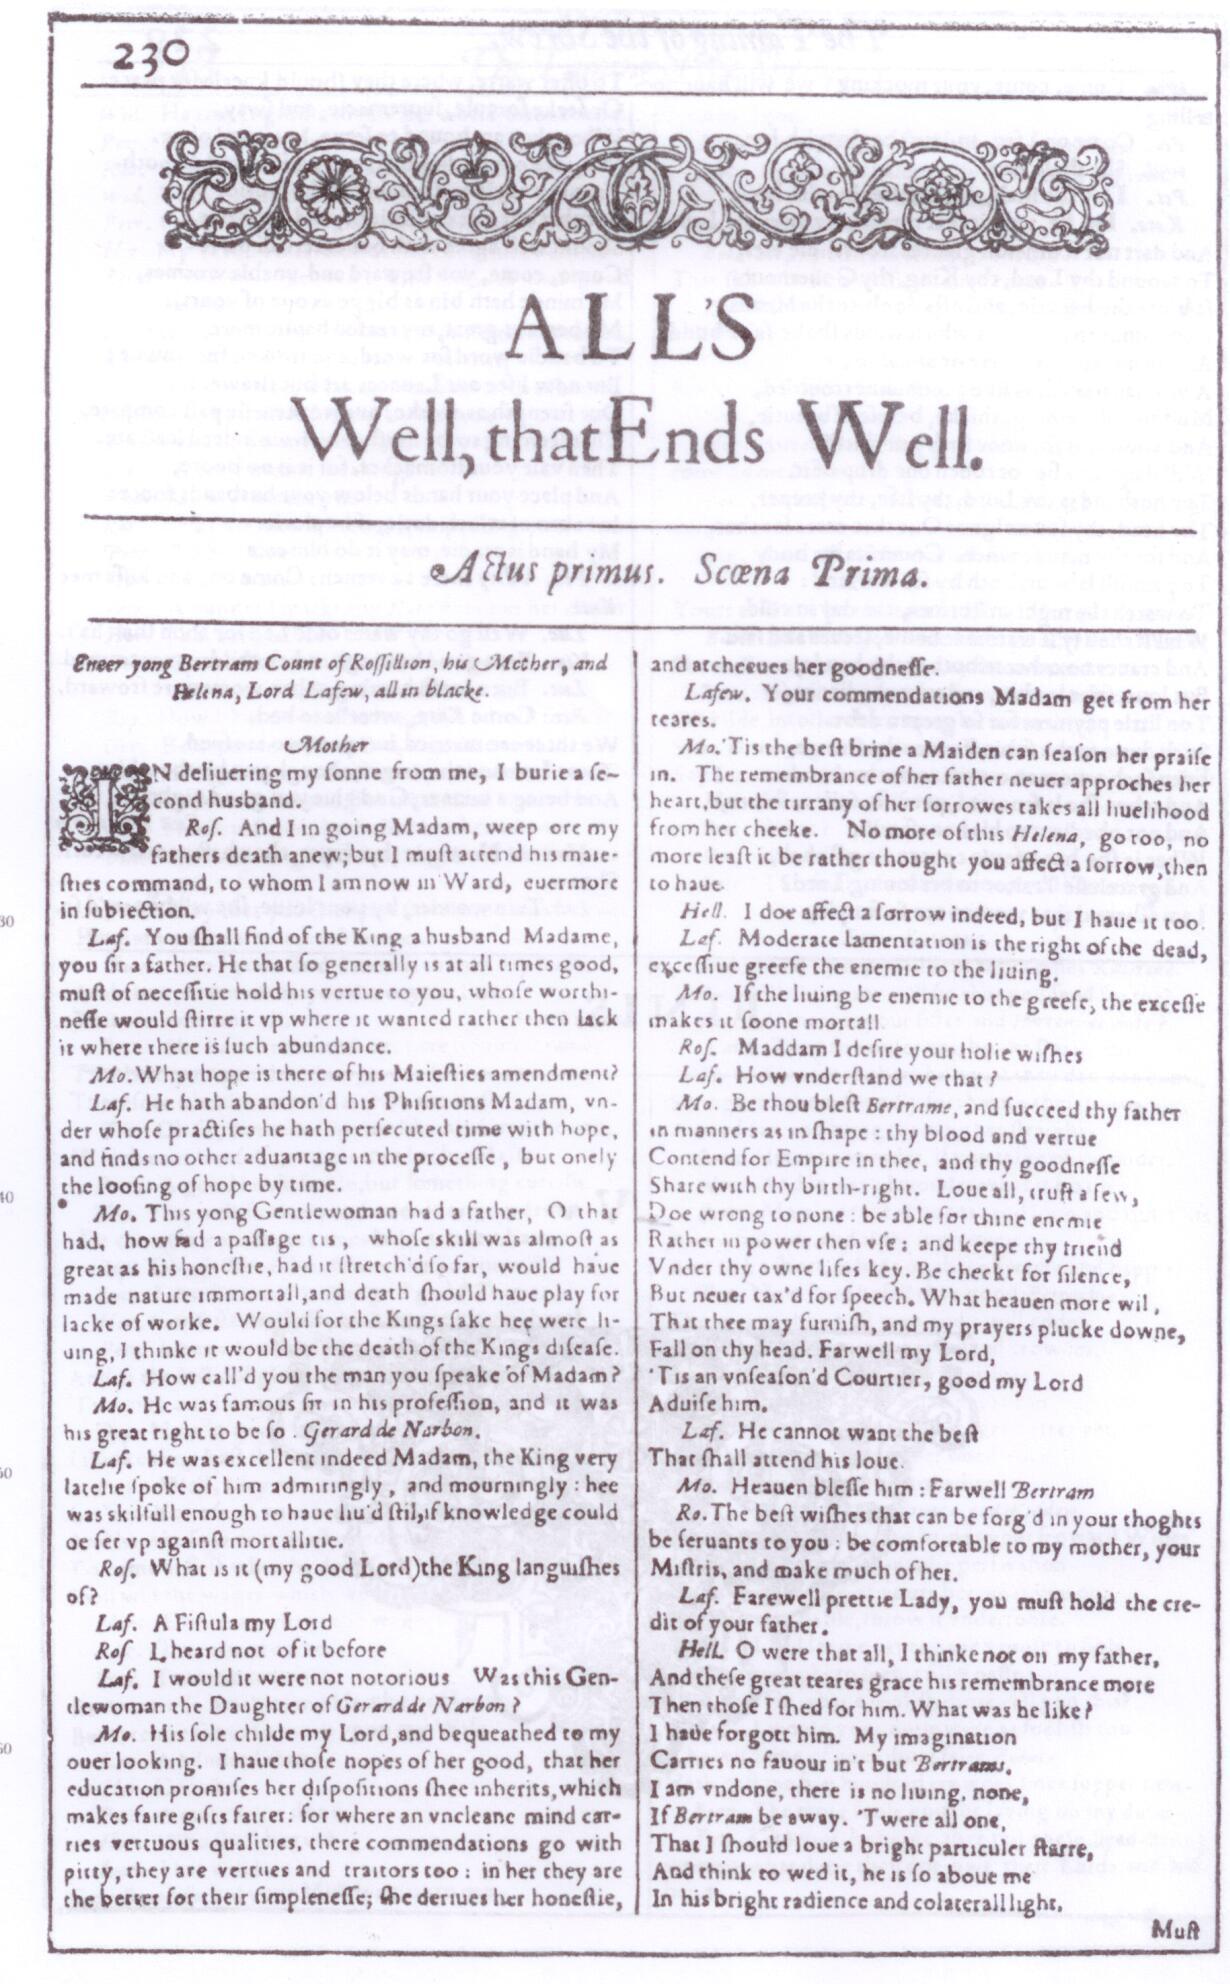 Shakespeare Unbard Episode 27 Spoiler Alert Alls Well